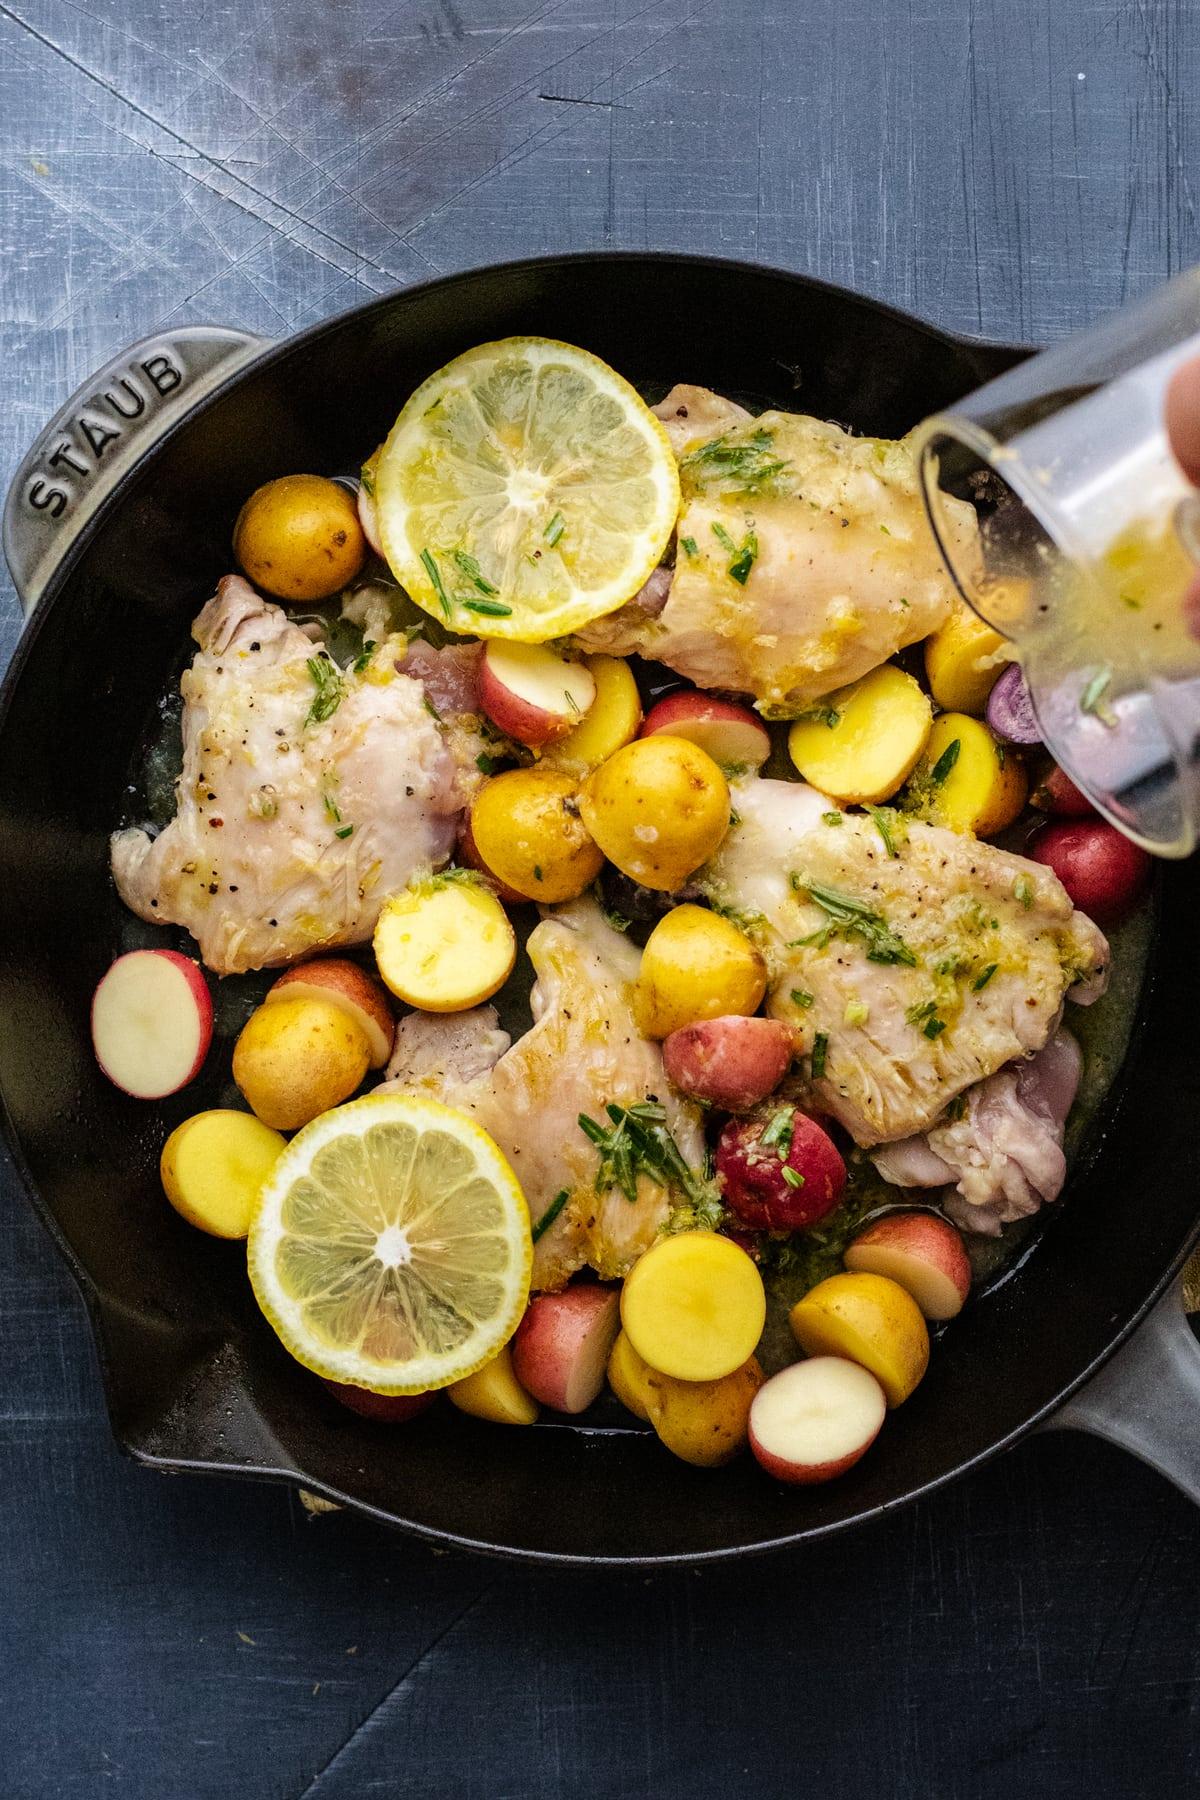 glass jar pouring sauce over lemon rosemary chicken in black skillet pan.